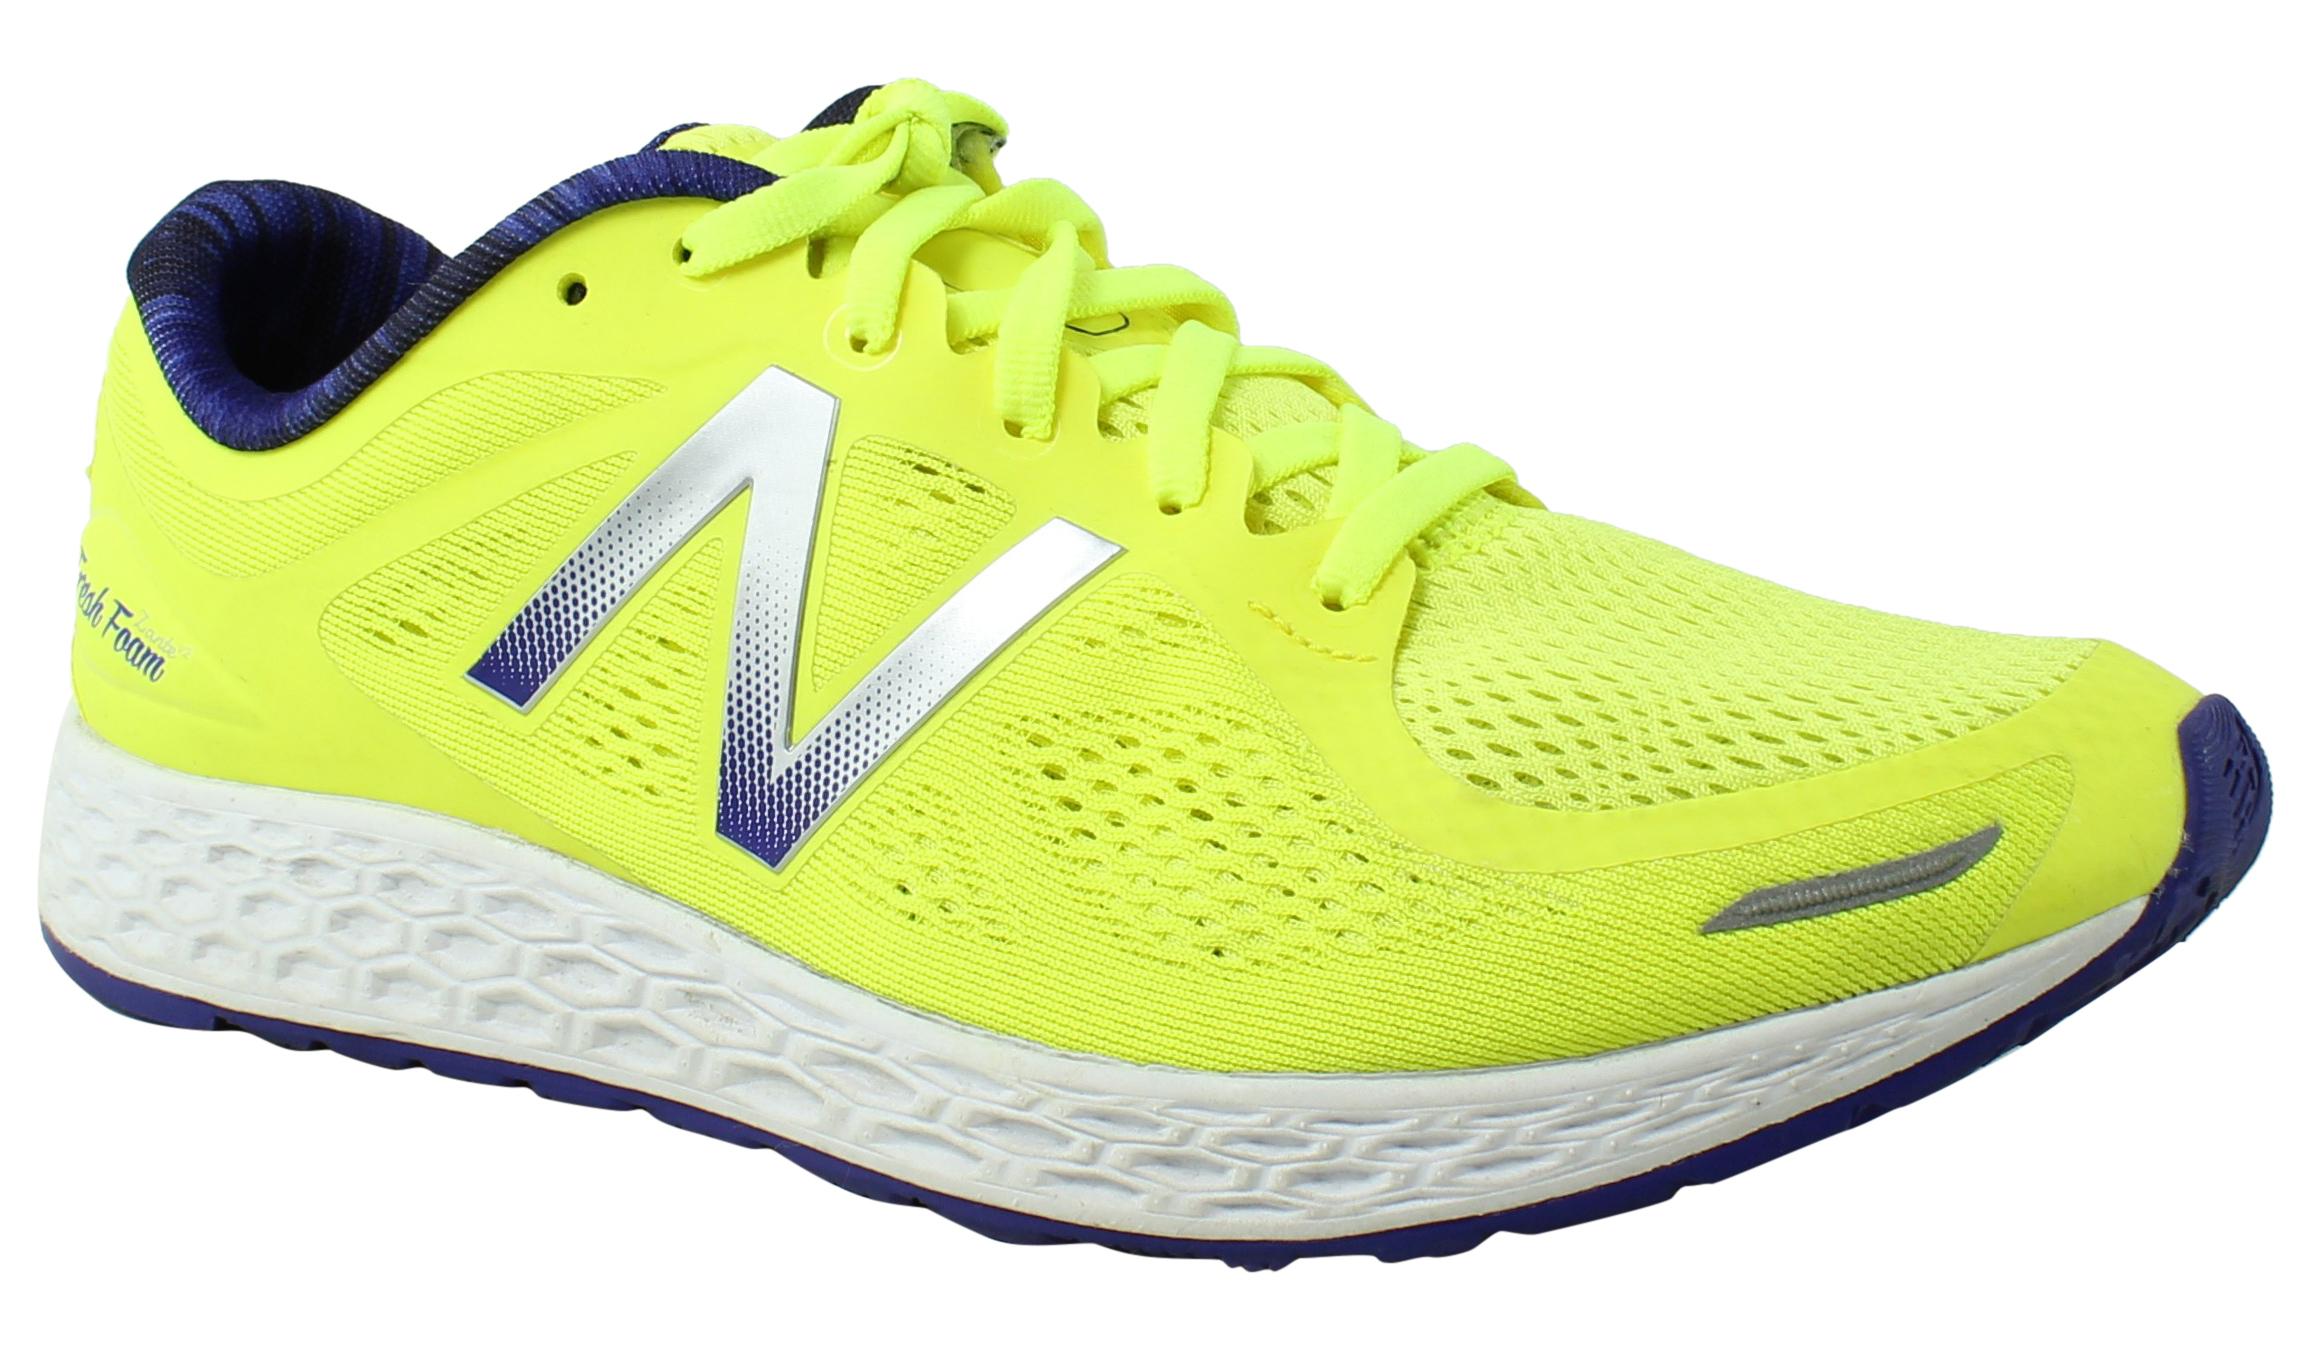 New Balance Yellow Womens - Yellow Balance Running Shoes Size 8.5 (347100) d12348